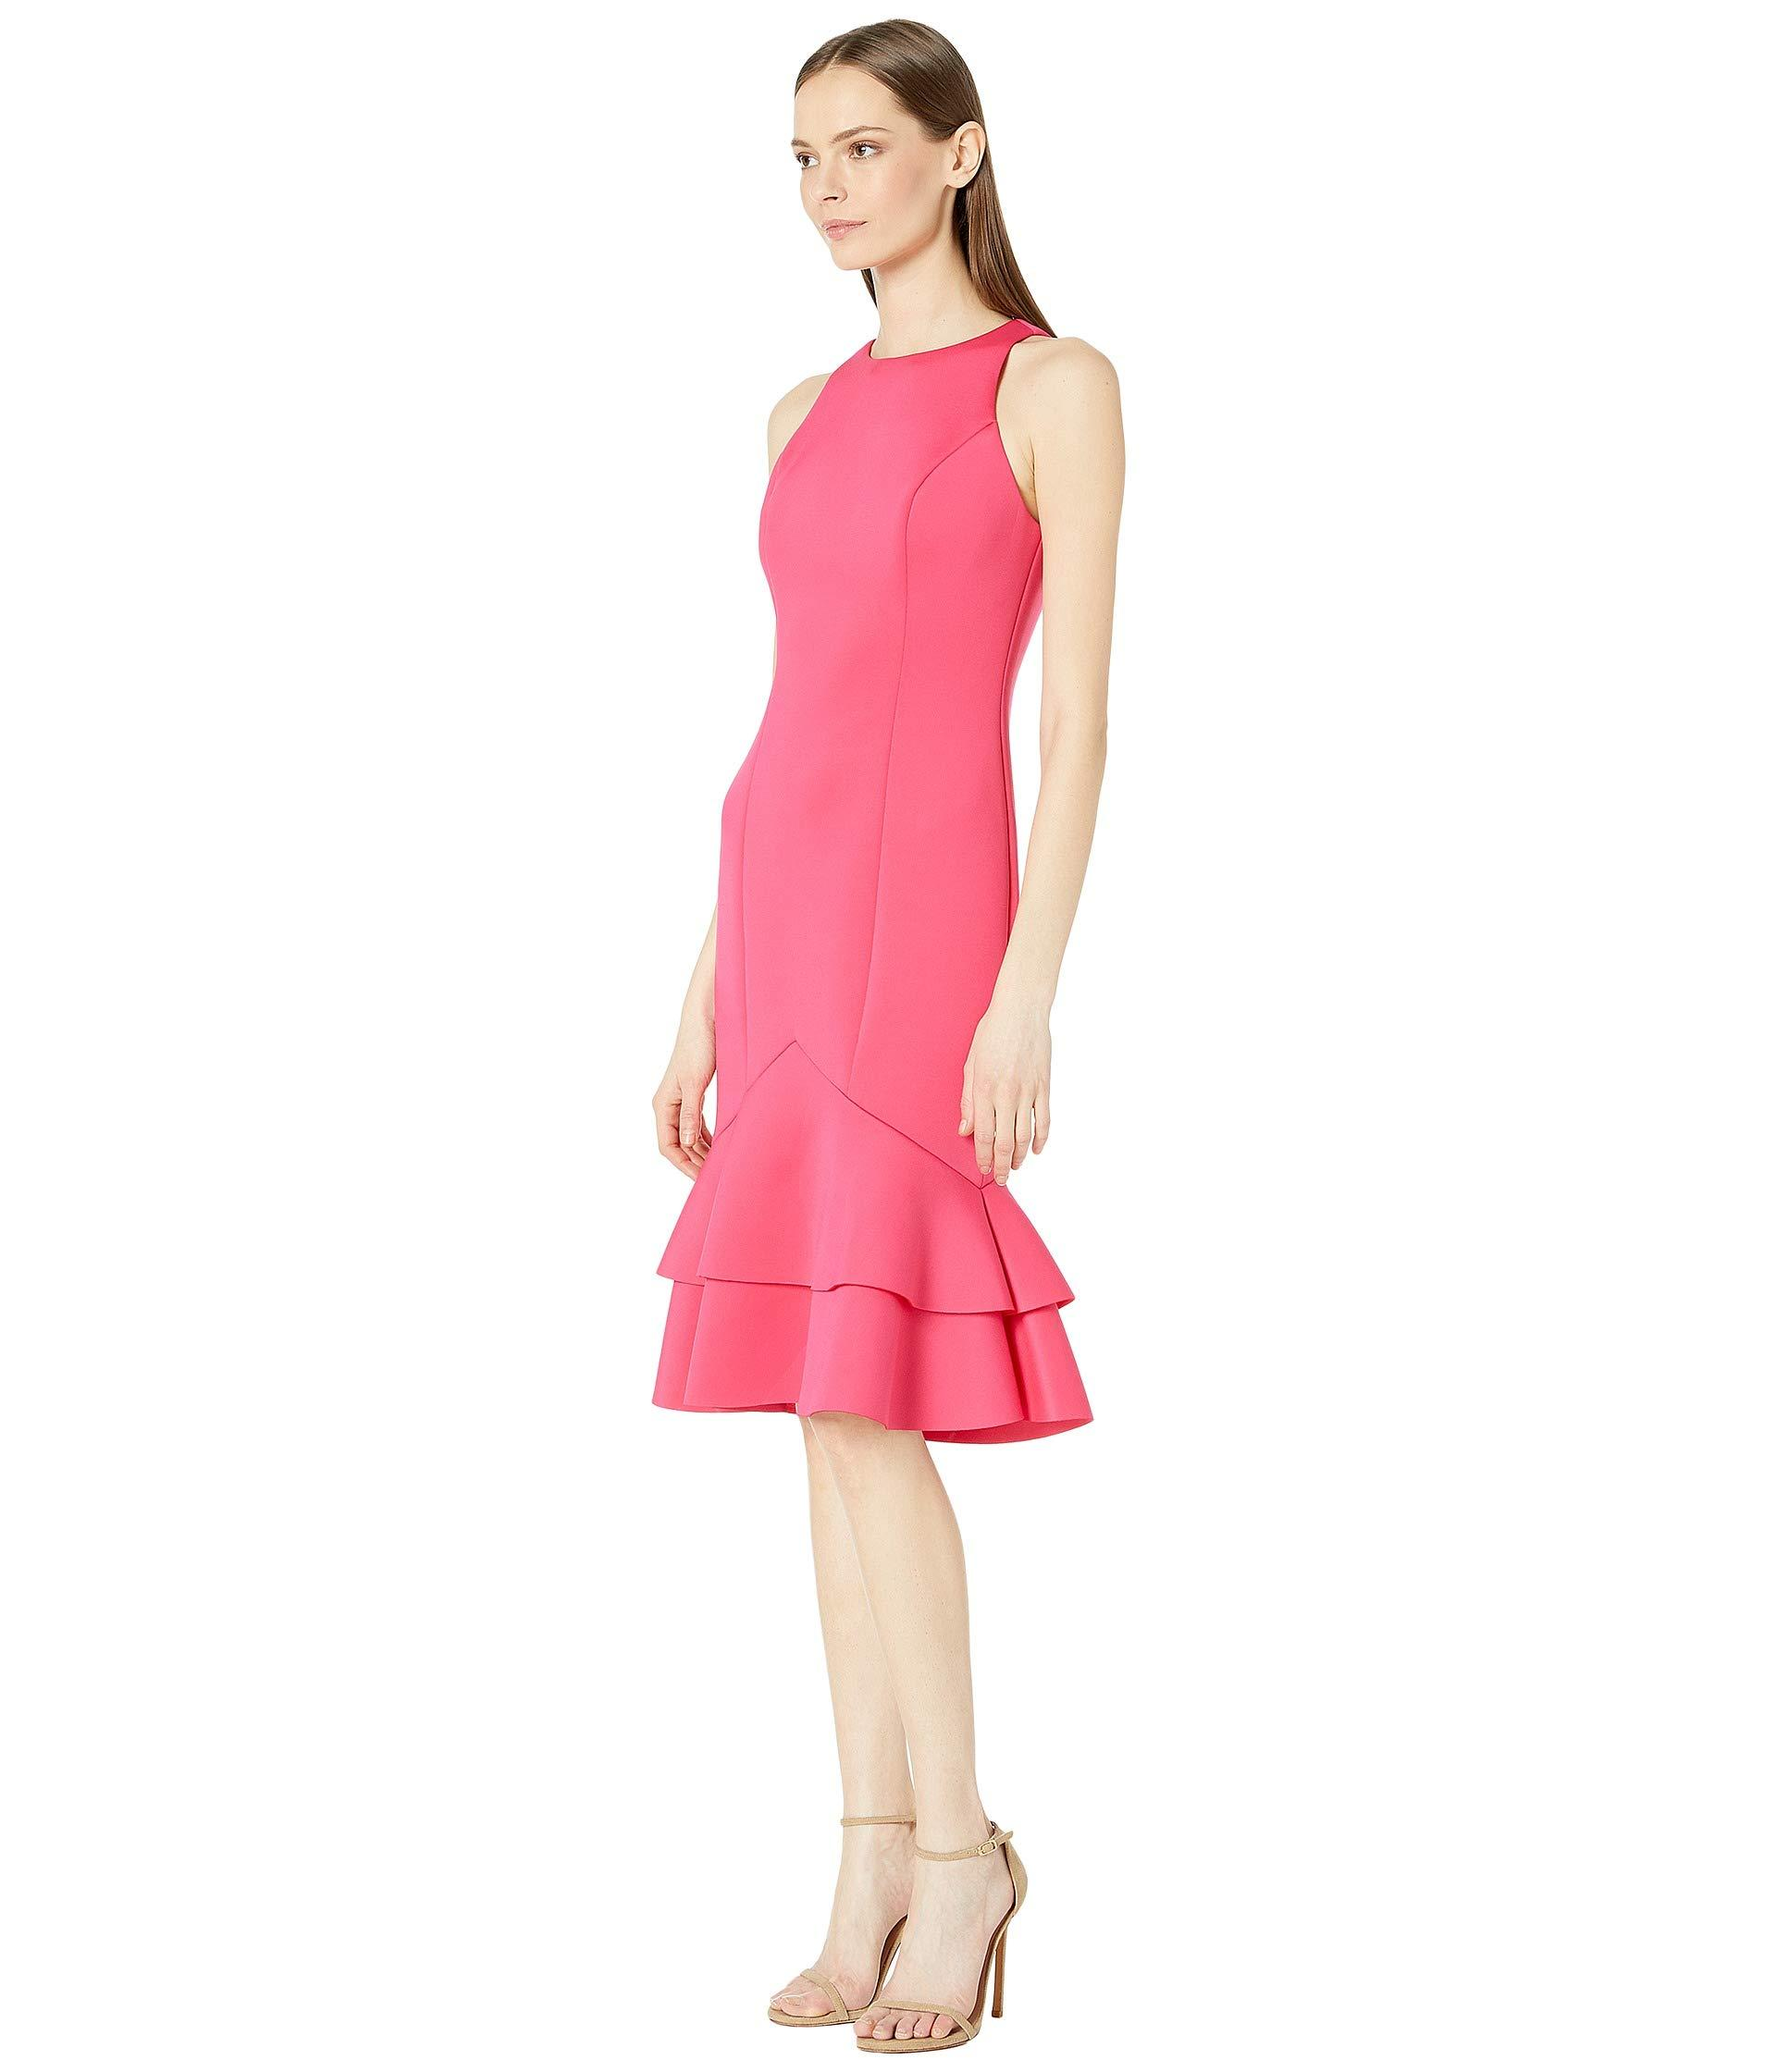 3177f24bc8bd4 Lyst - Badgley Mischka Two Tier Scuba (watermelon) Women's Dress in Pink